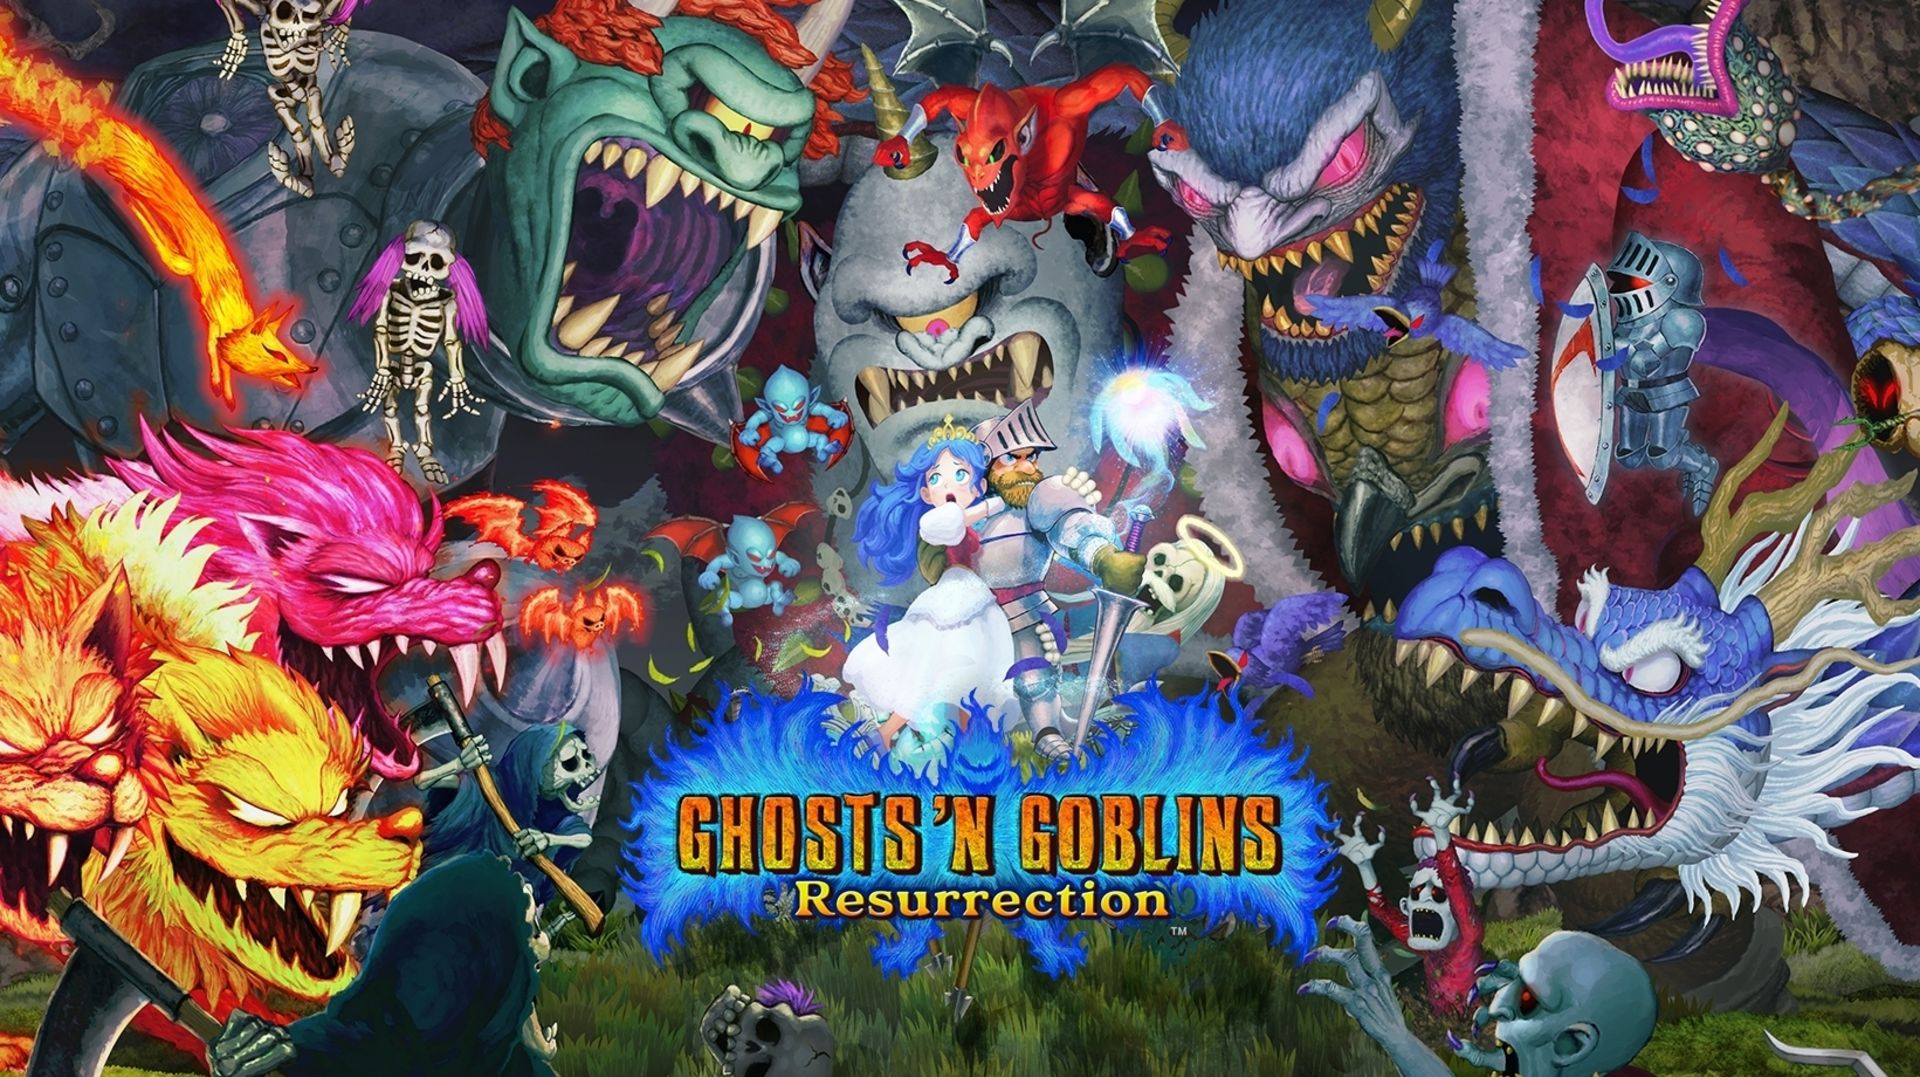 Ghosts n' Goblins Resurrection